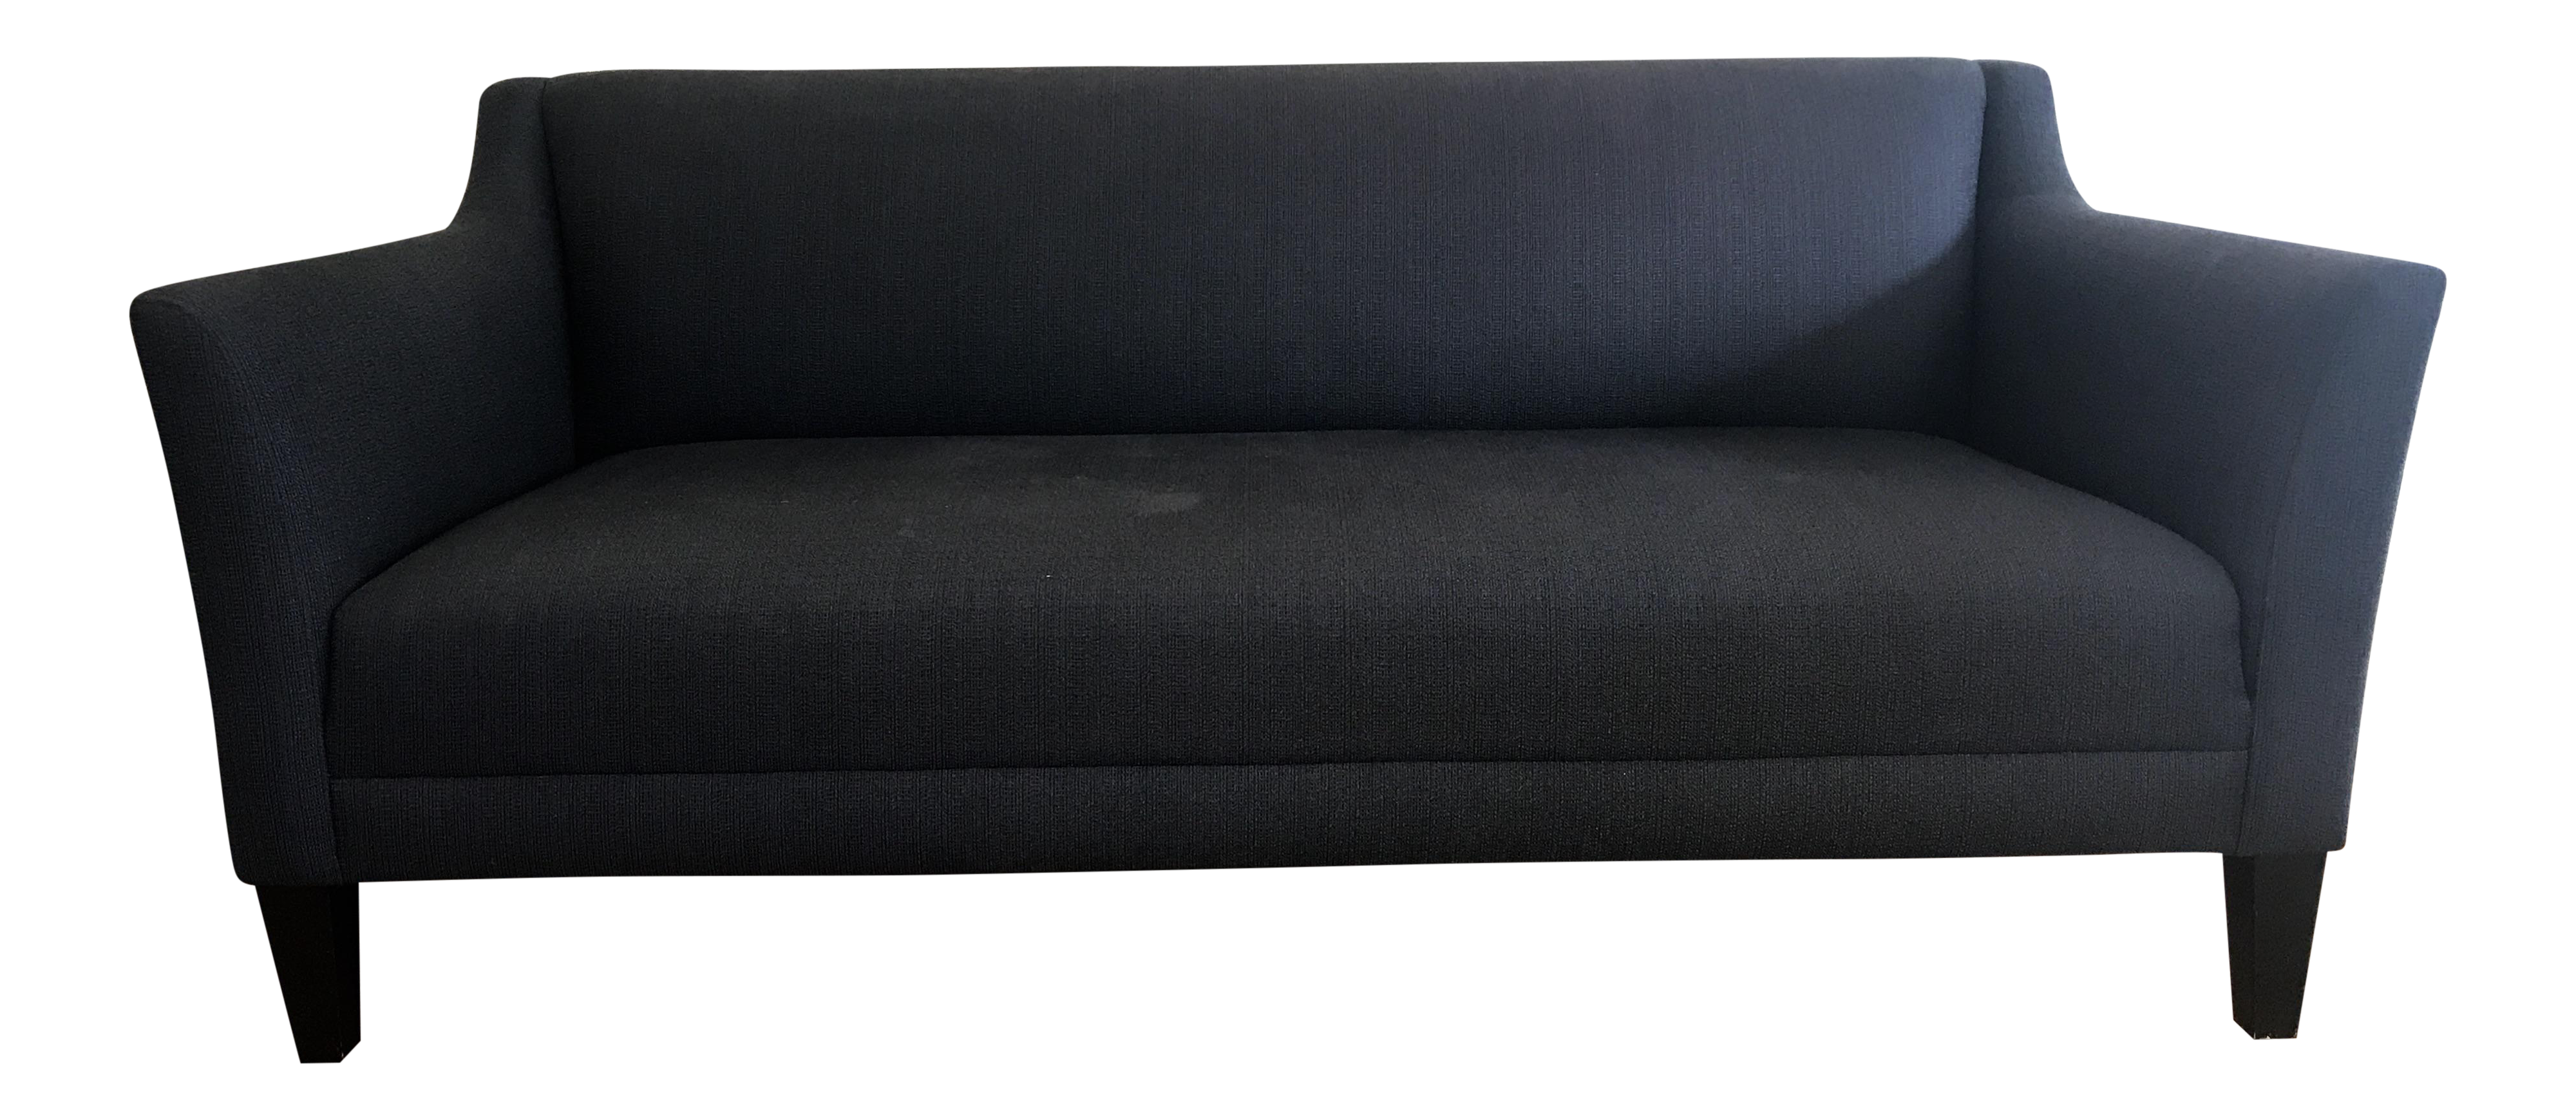 Midnight Blue Margot Sofa From Crate amp Barrel Chairish